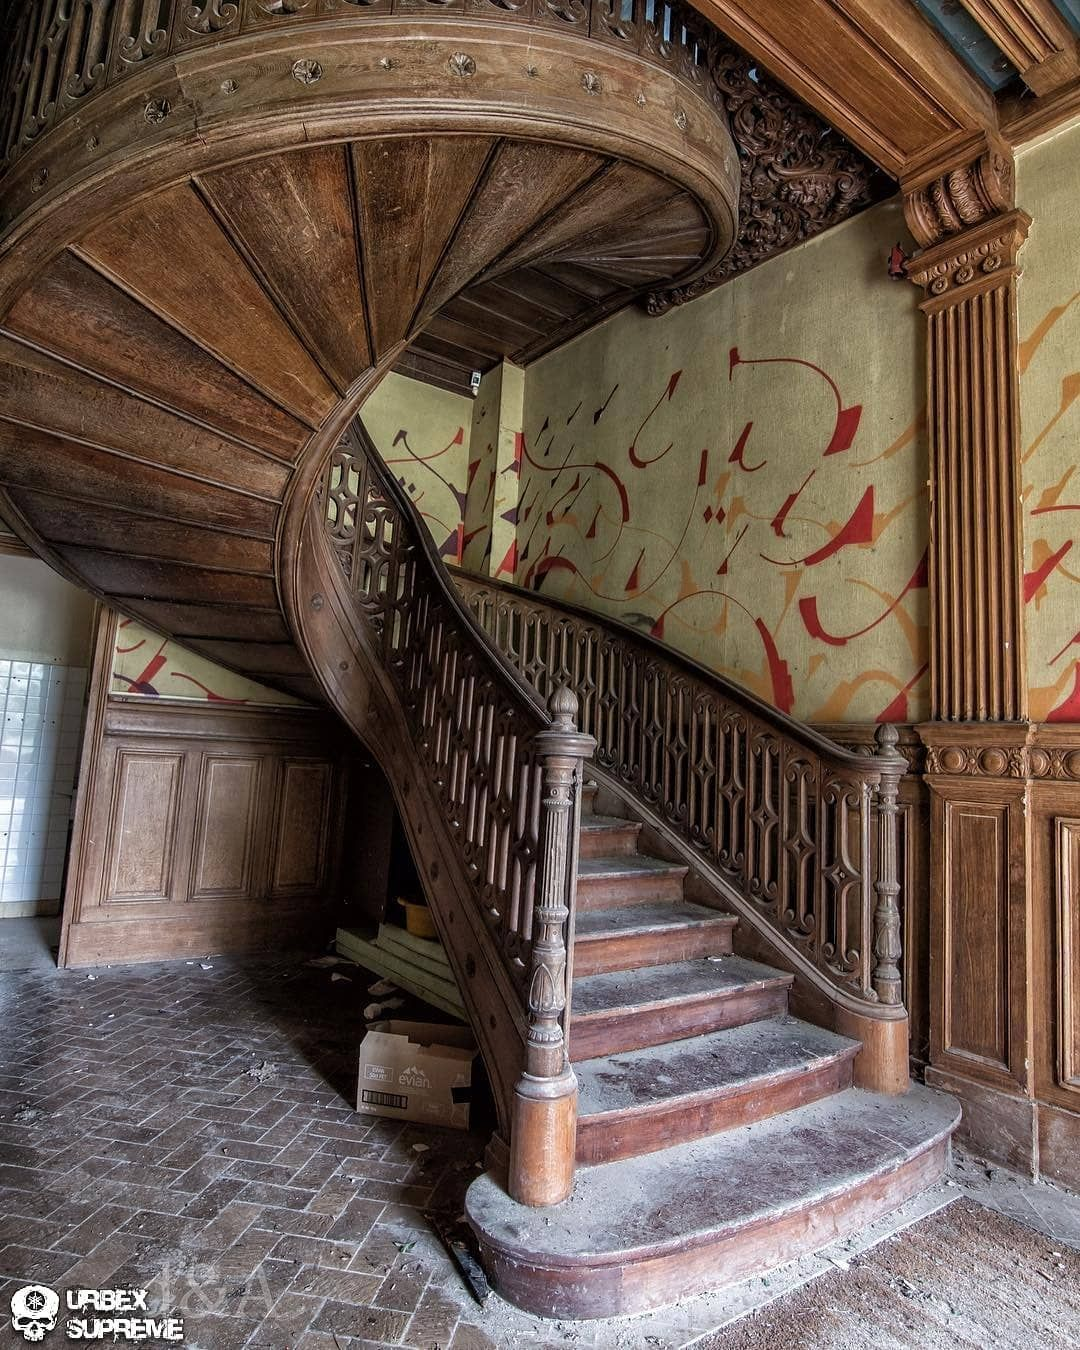 26 Incredible Under The Stairs Utilization Ideas: Urbex Supreme! #urbex_supreme